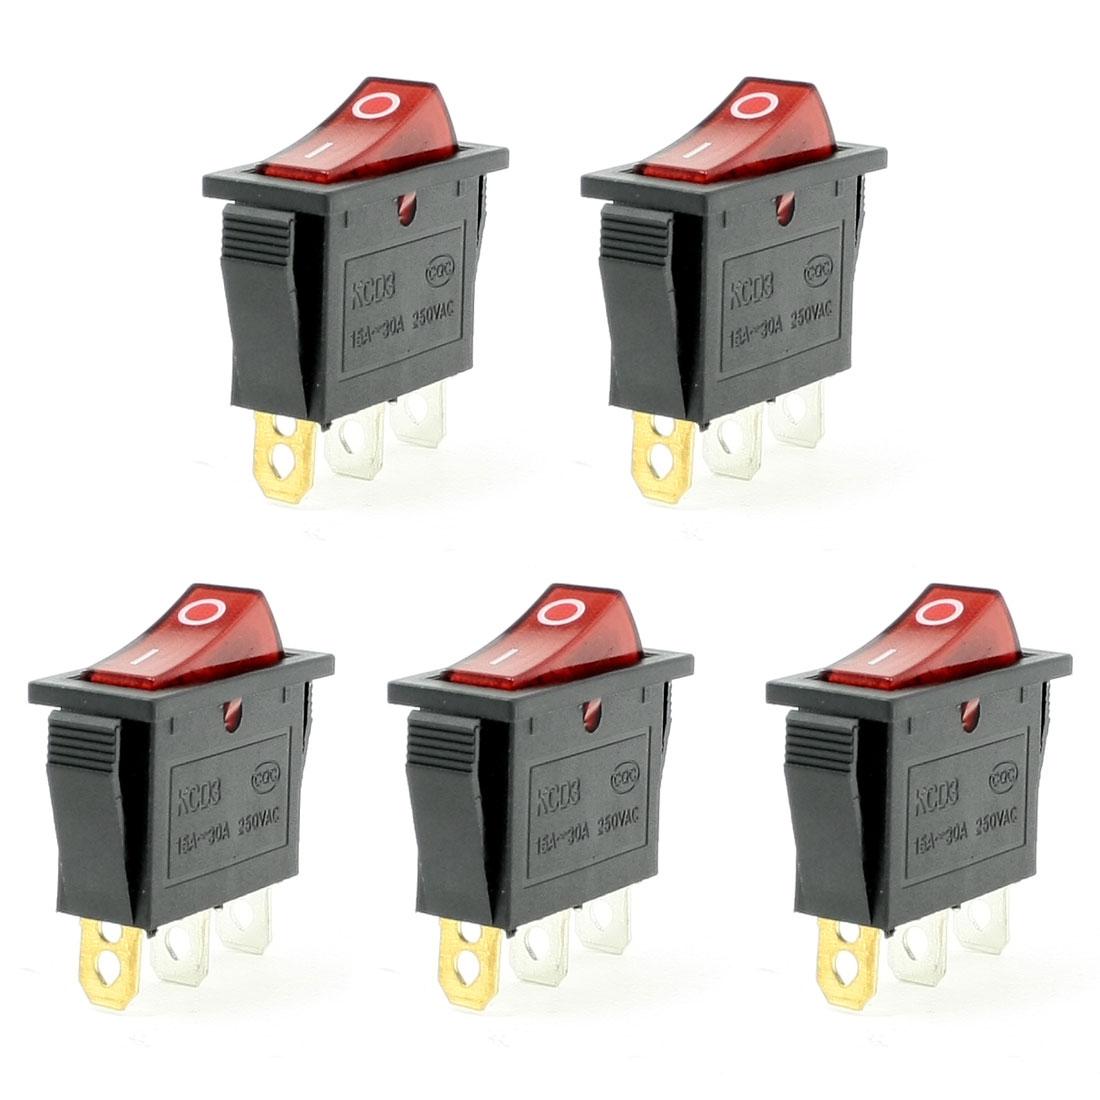 5 Pcs 3 Pin SPST Red Neon Light On/Off Rocker Switch AC 250V 15/30A